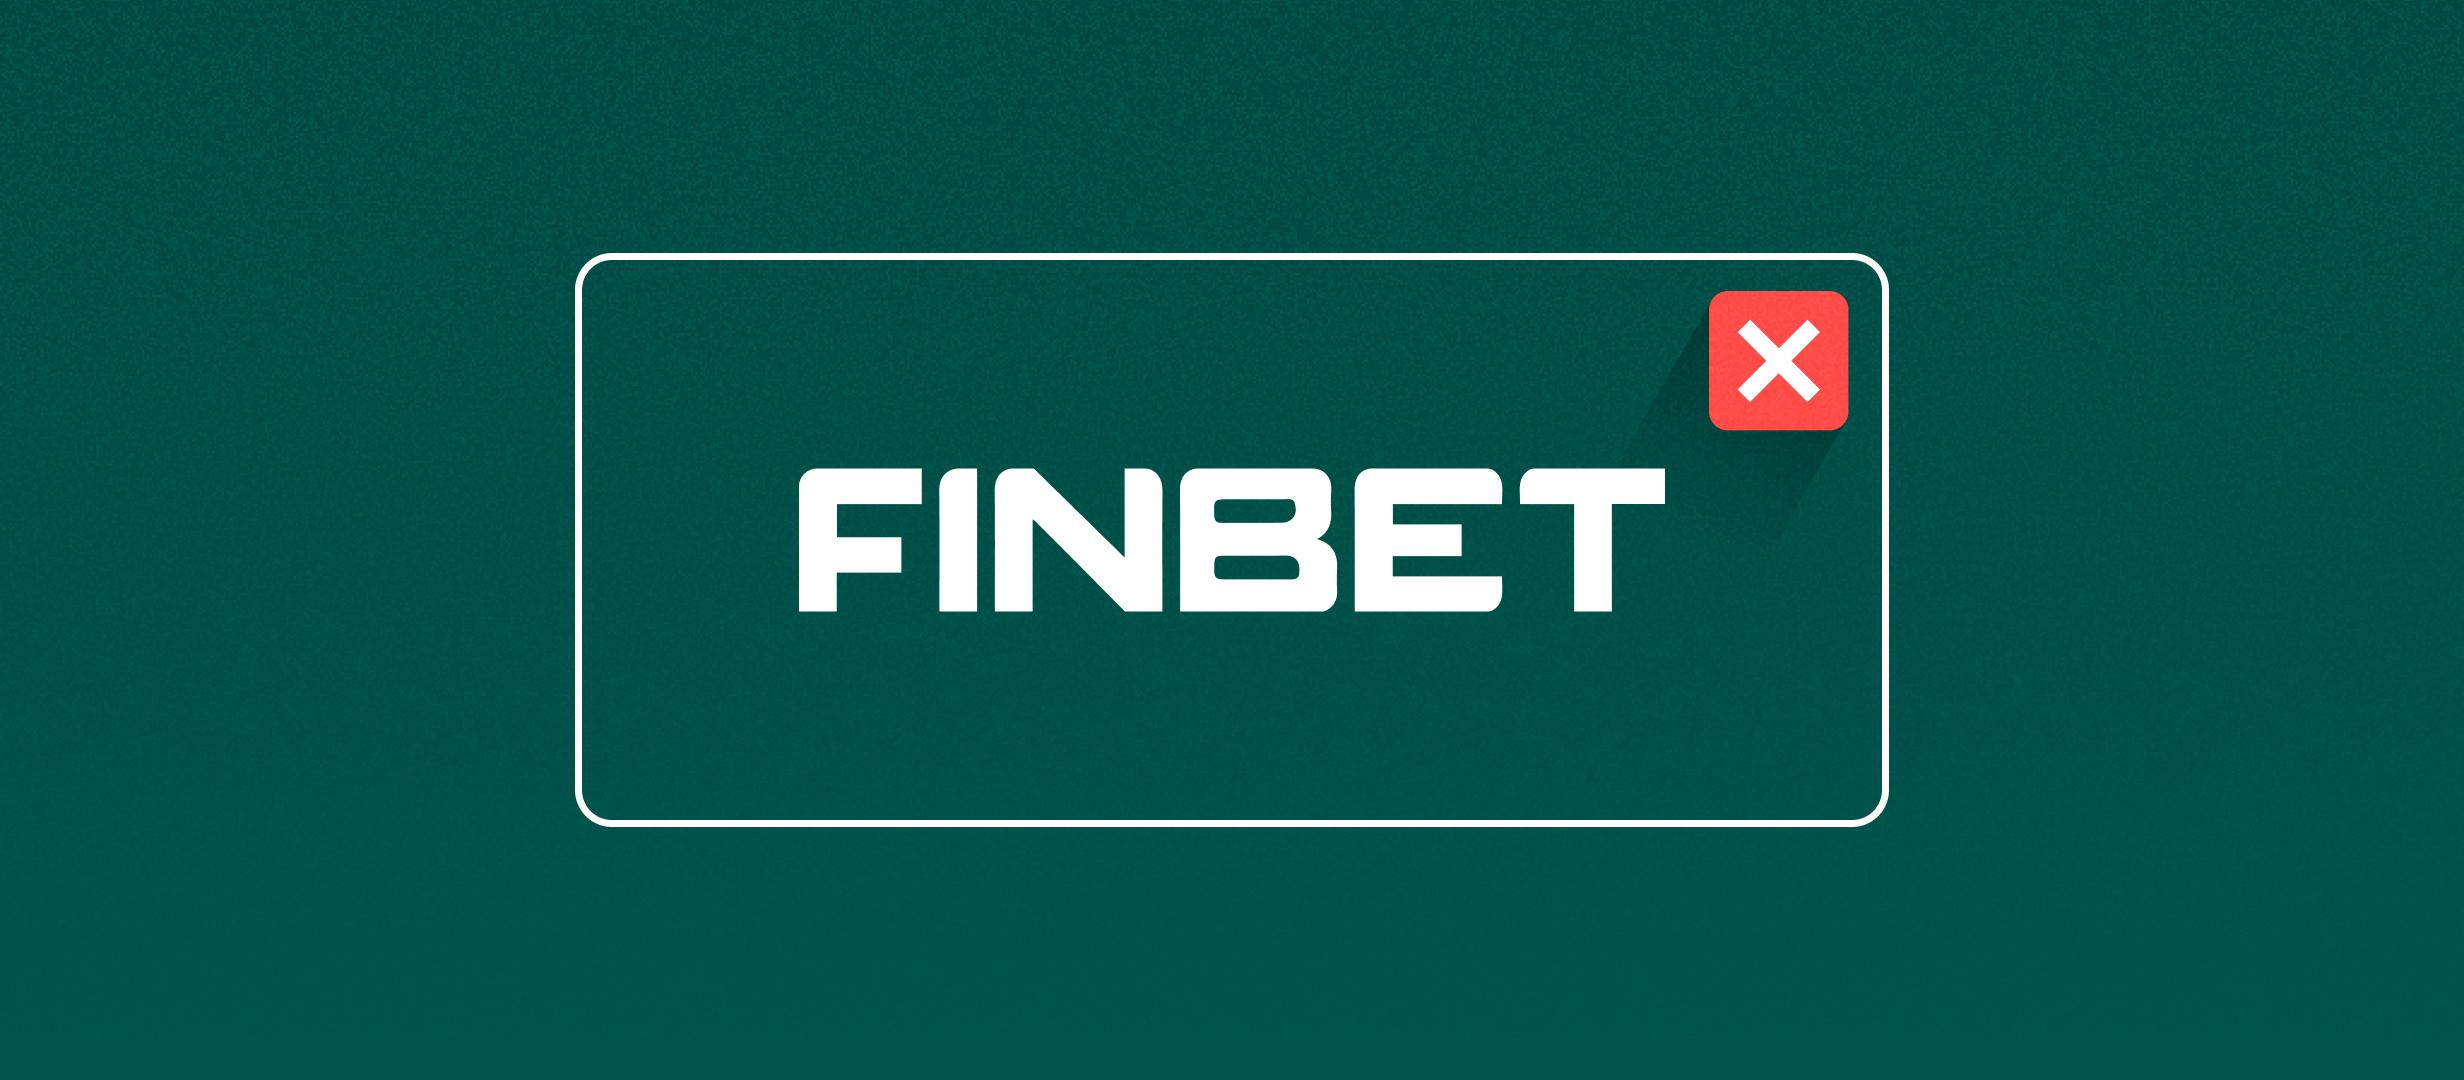 Finbet прекращает работу на территории Казахстана